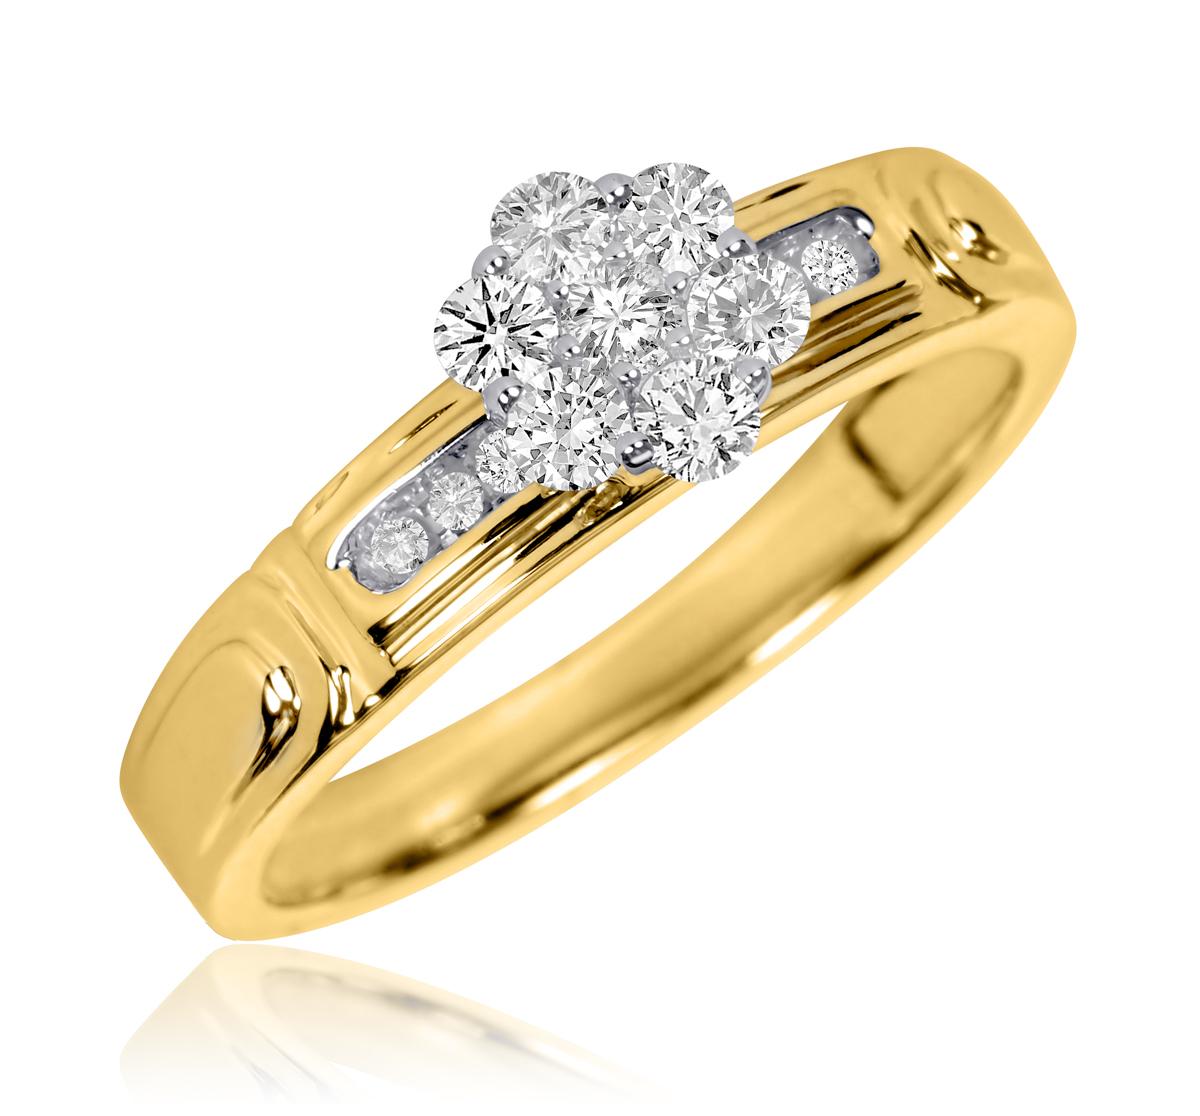 1/3 CT. T.W. Round Cut Diamond Ladies Engagement Ring 14K Yellow Gold- Size 8